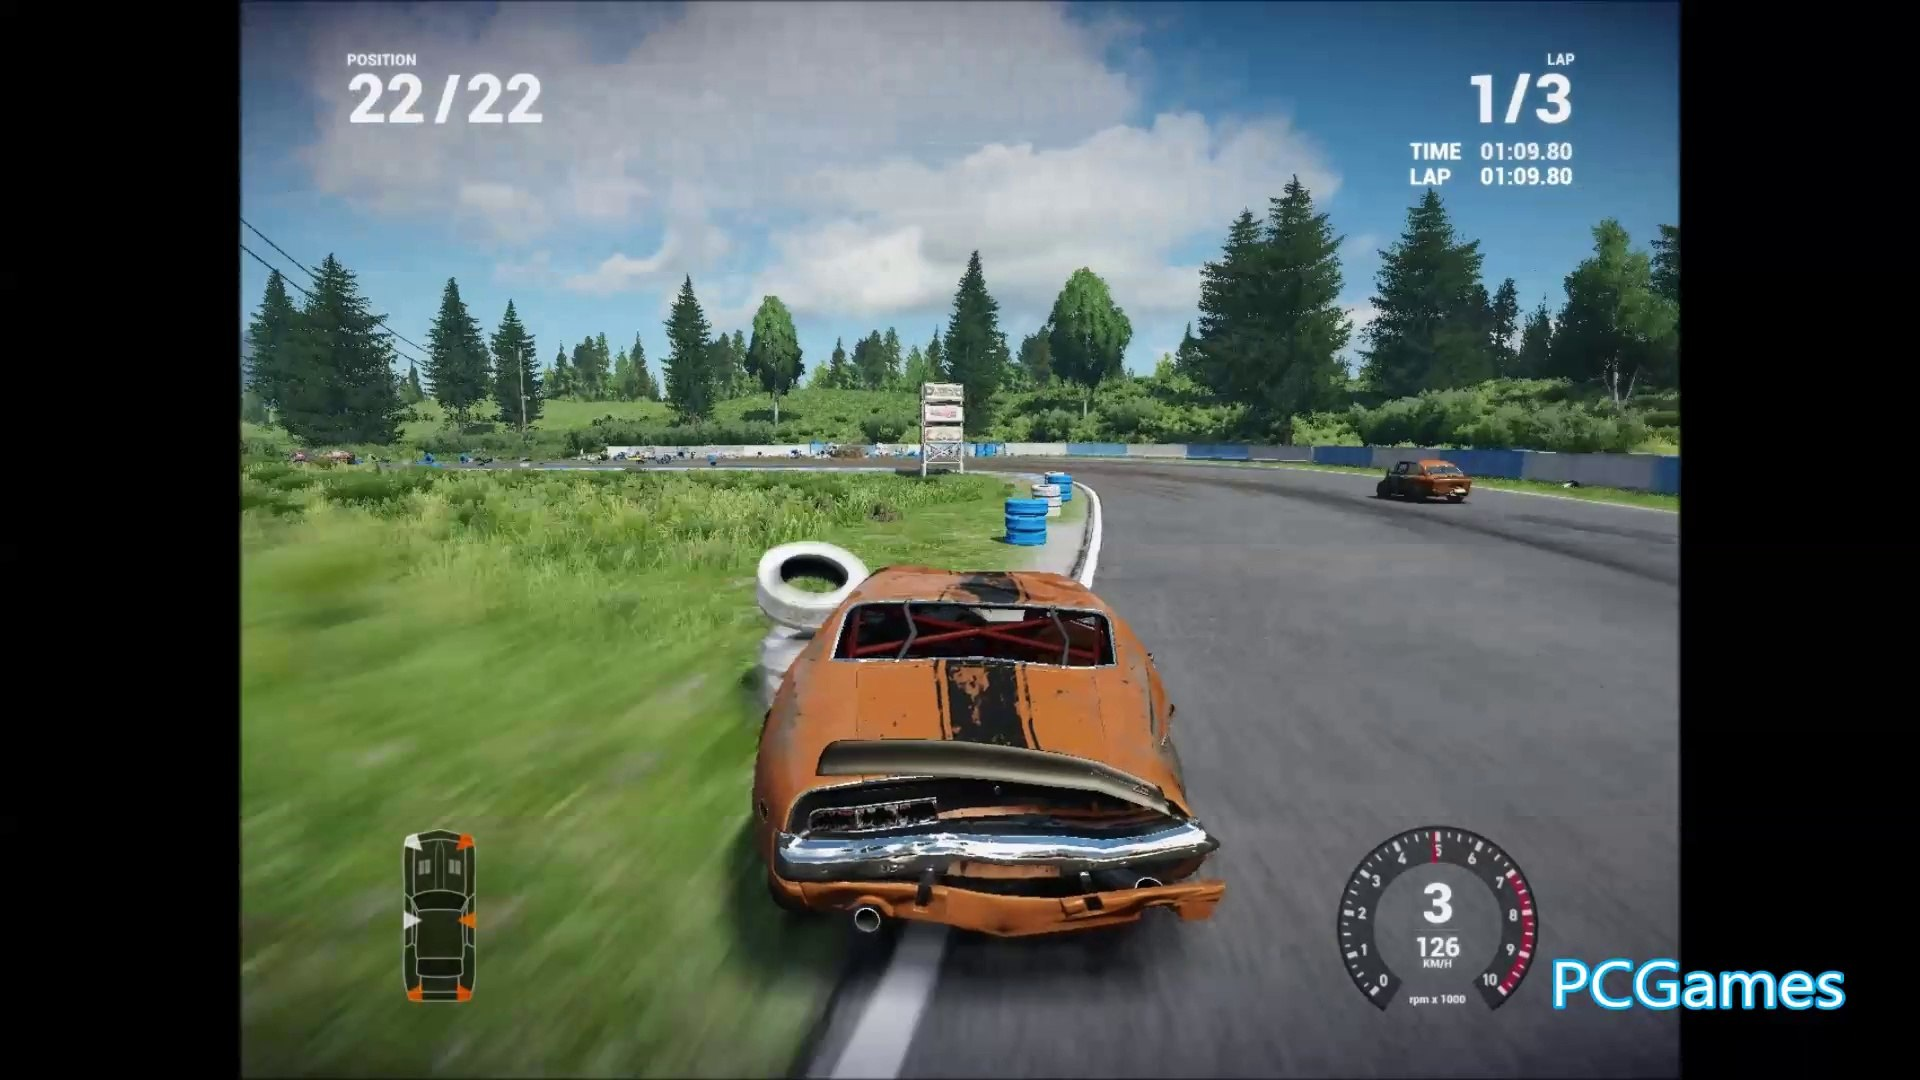 Next Car Game: Big Crashes (PC Games)